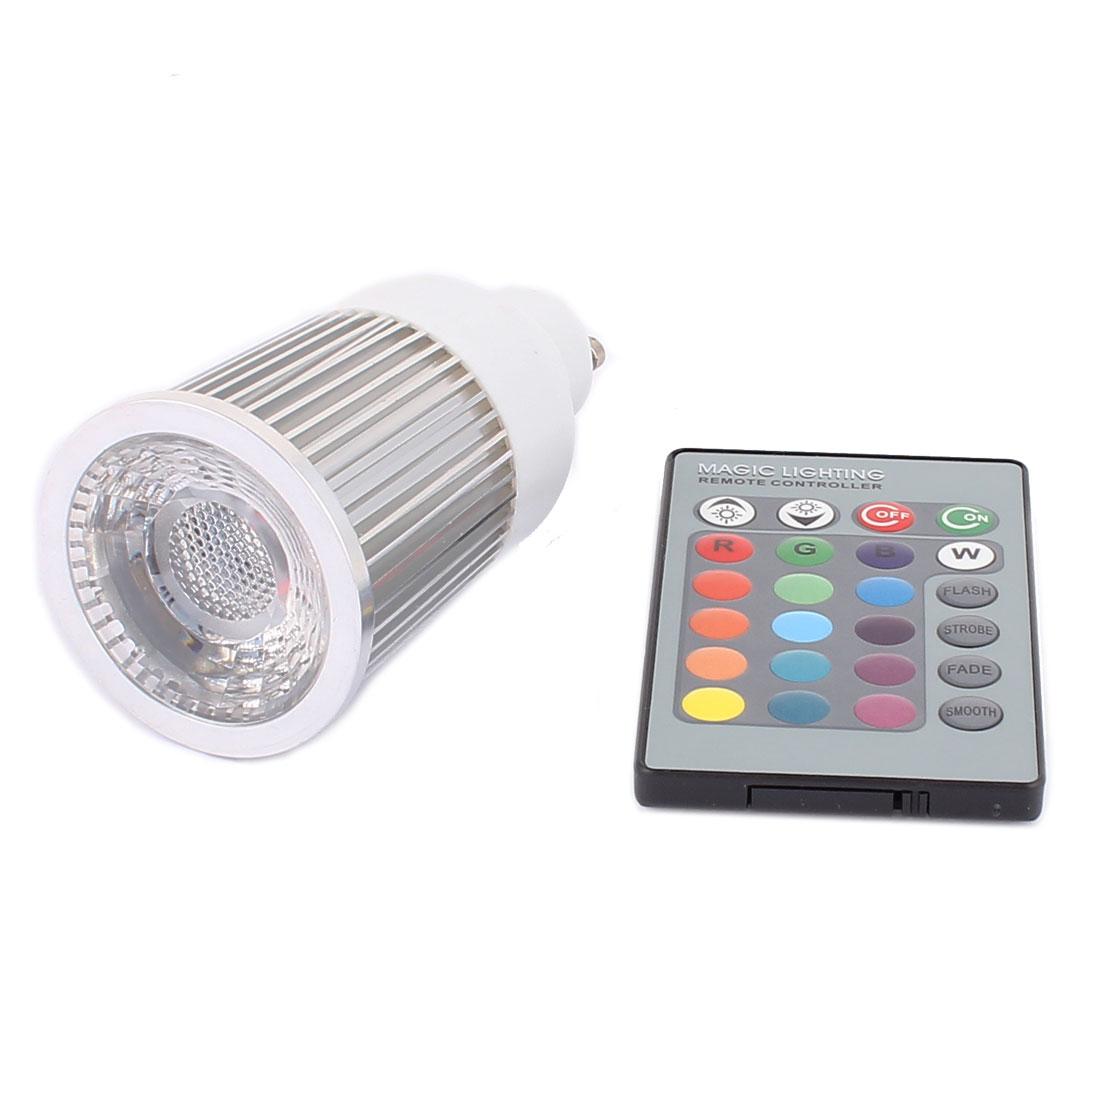 GU10 Adapter Decor Spotlight Light RGB LED Lamp Bulb 5W AC 85-265V w Remote Controller